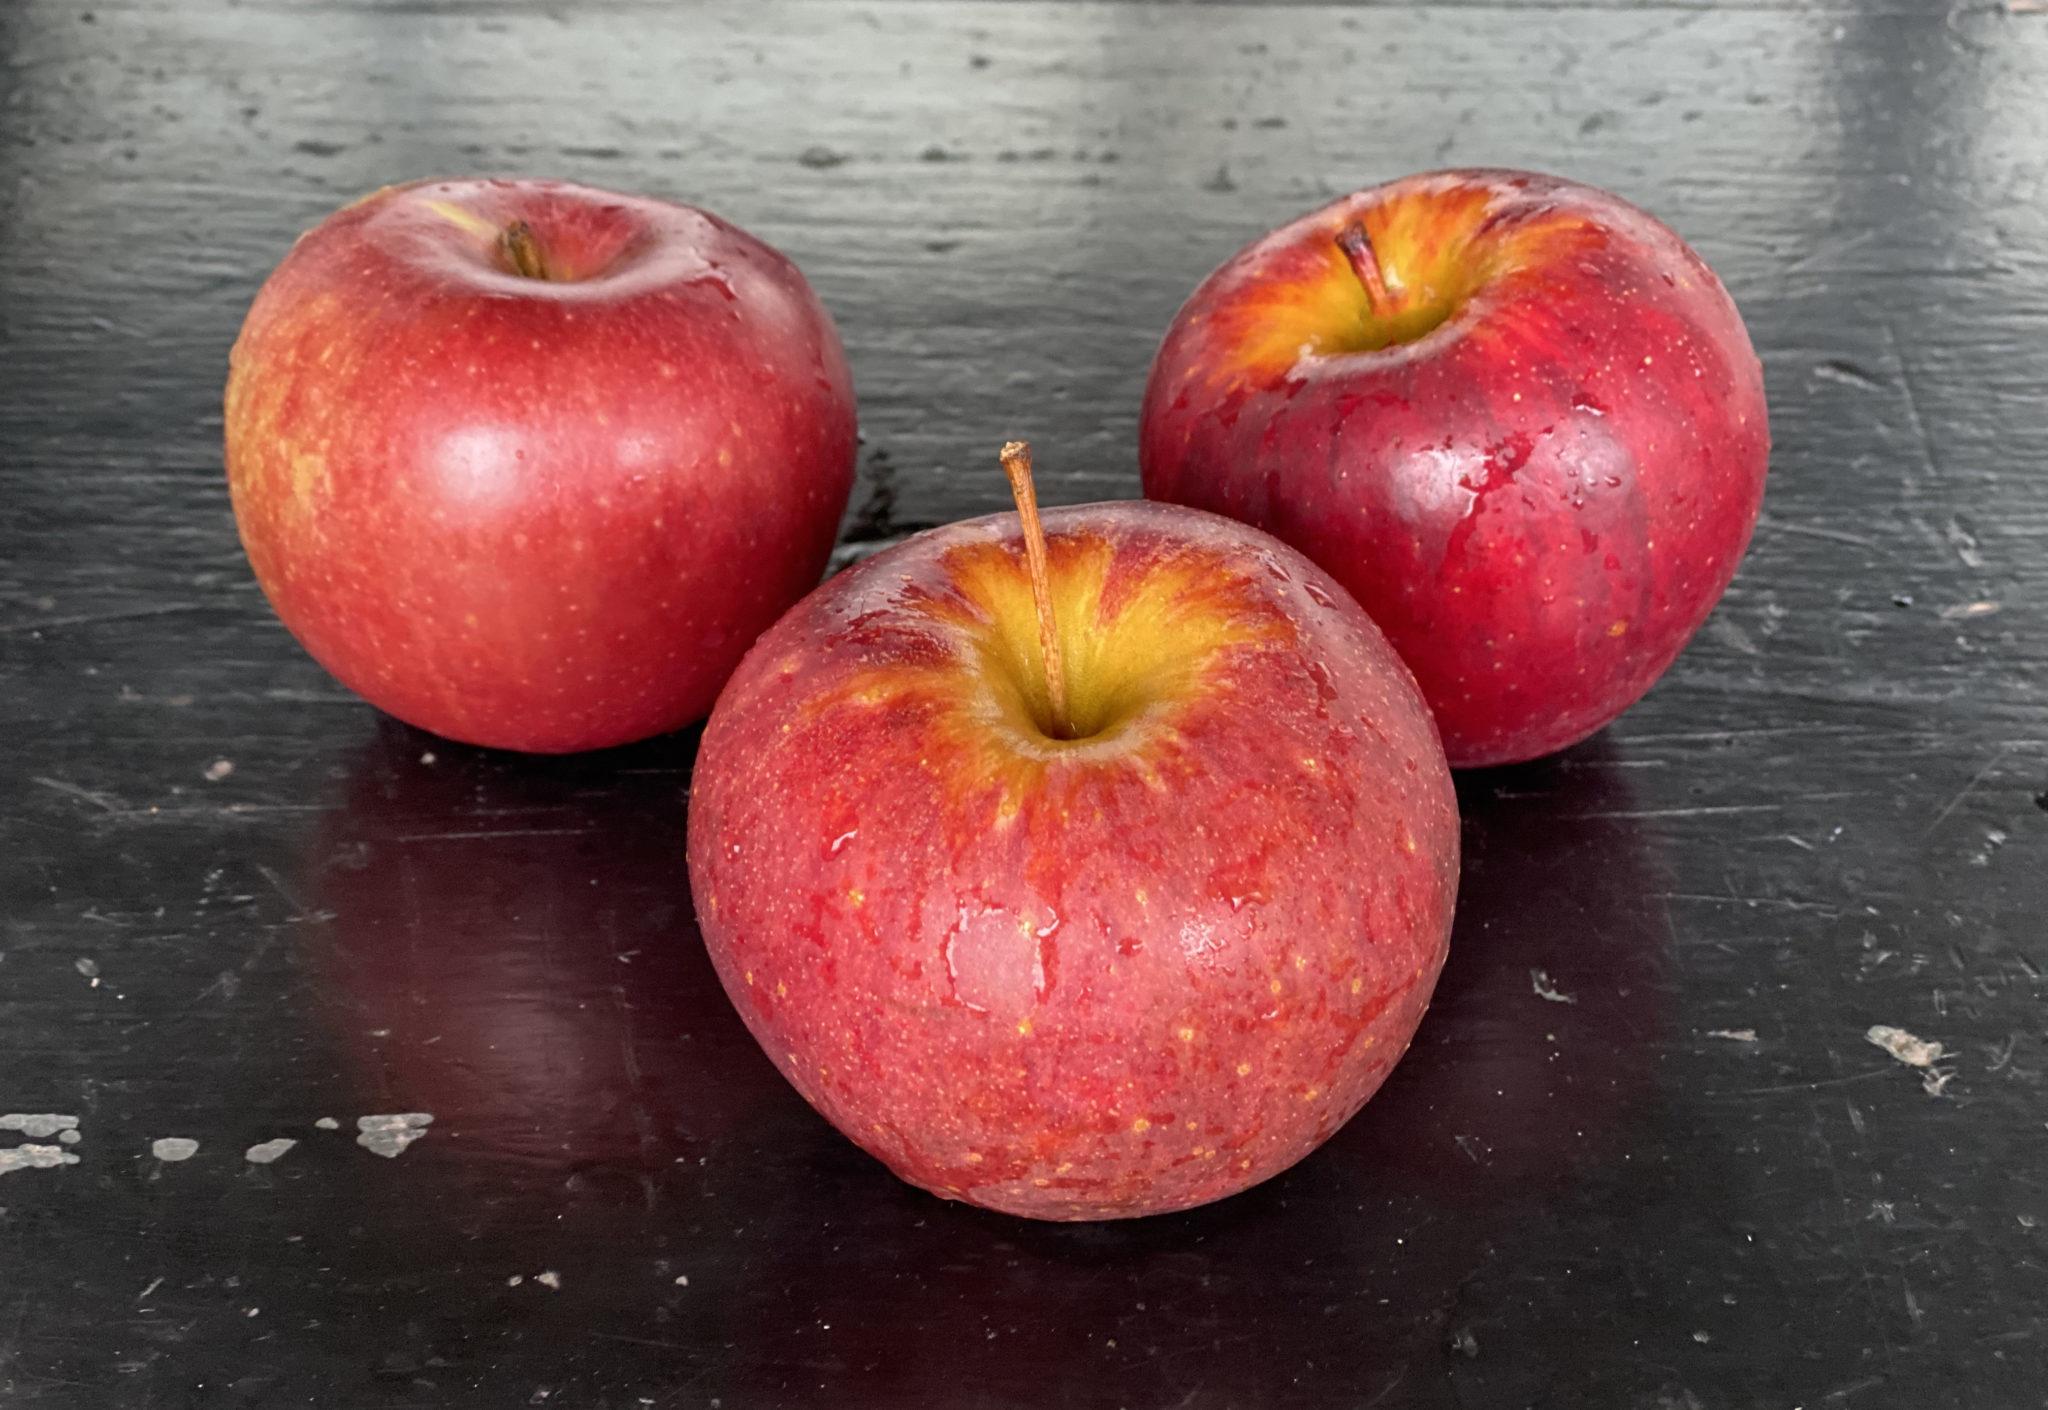 Stayman apples